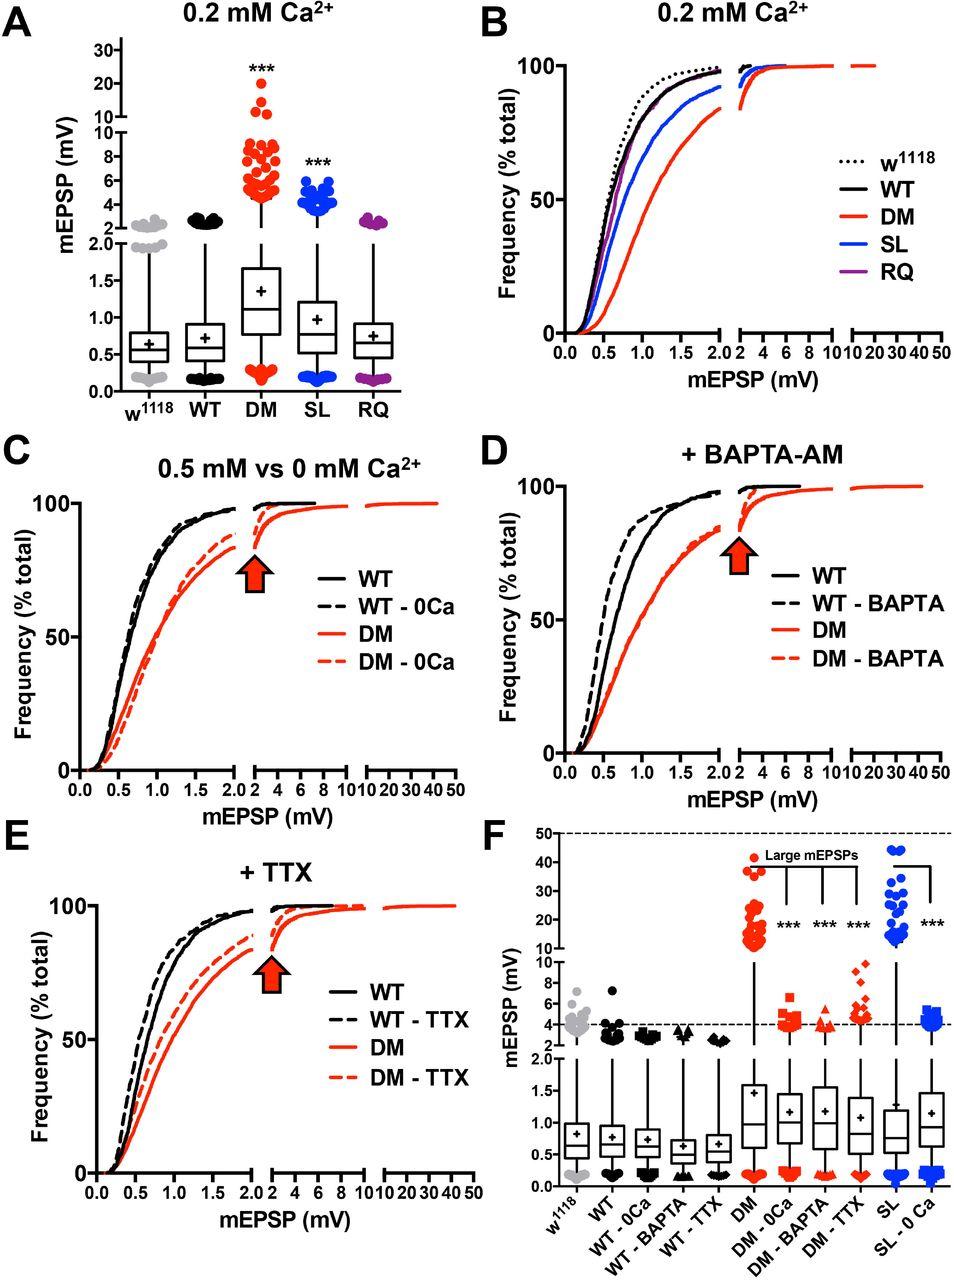 Drosophila Cav2 channels harboring human migraine mutations